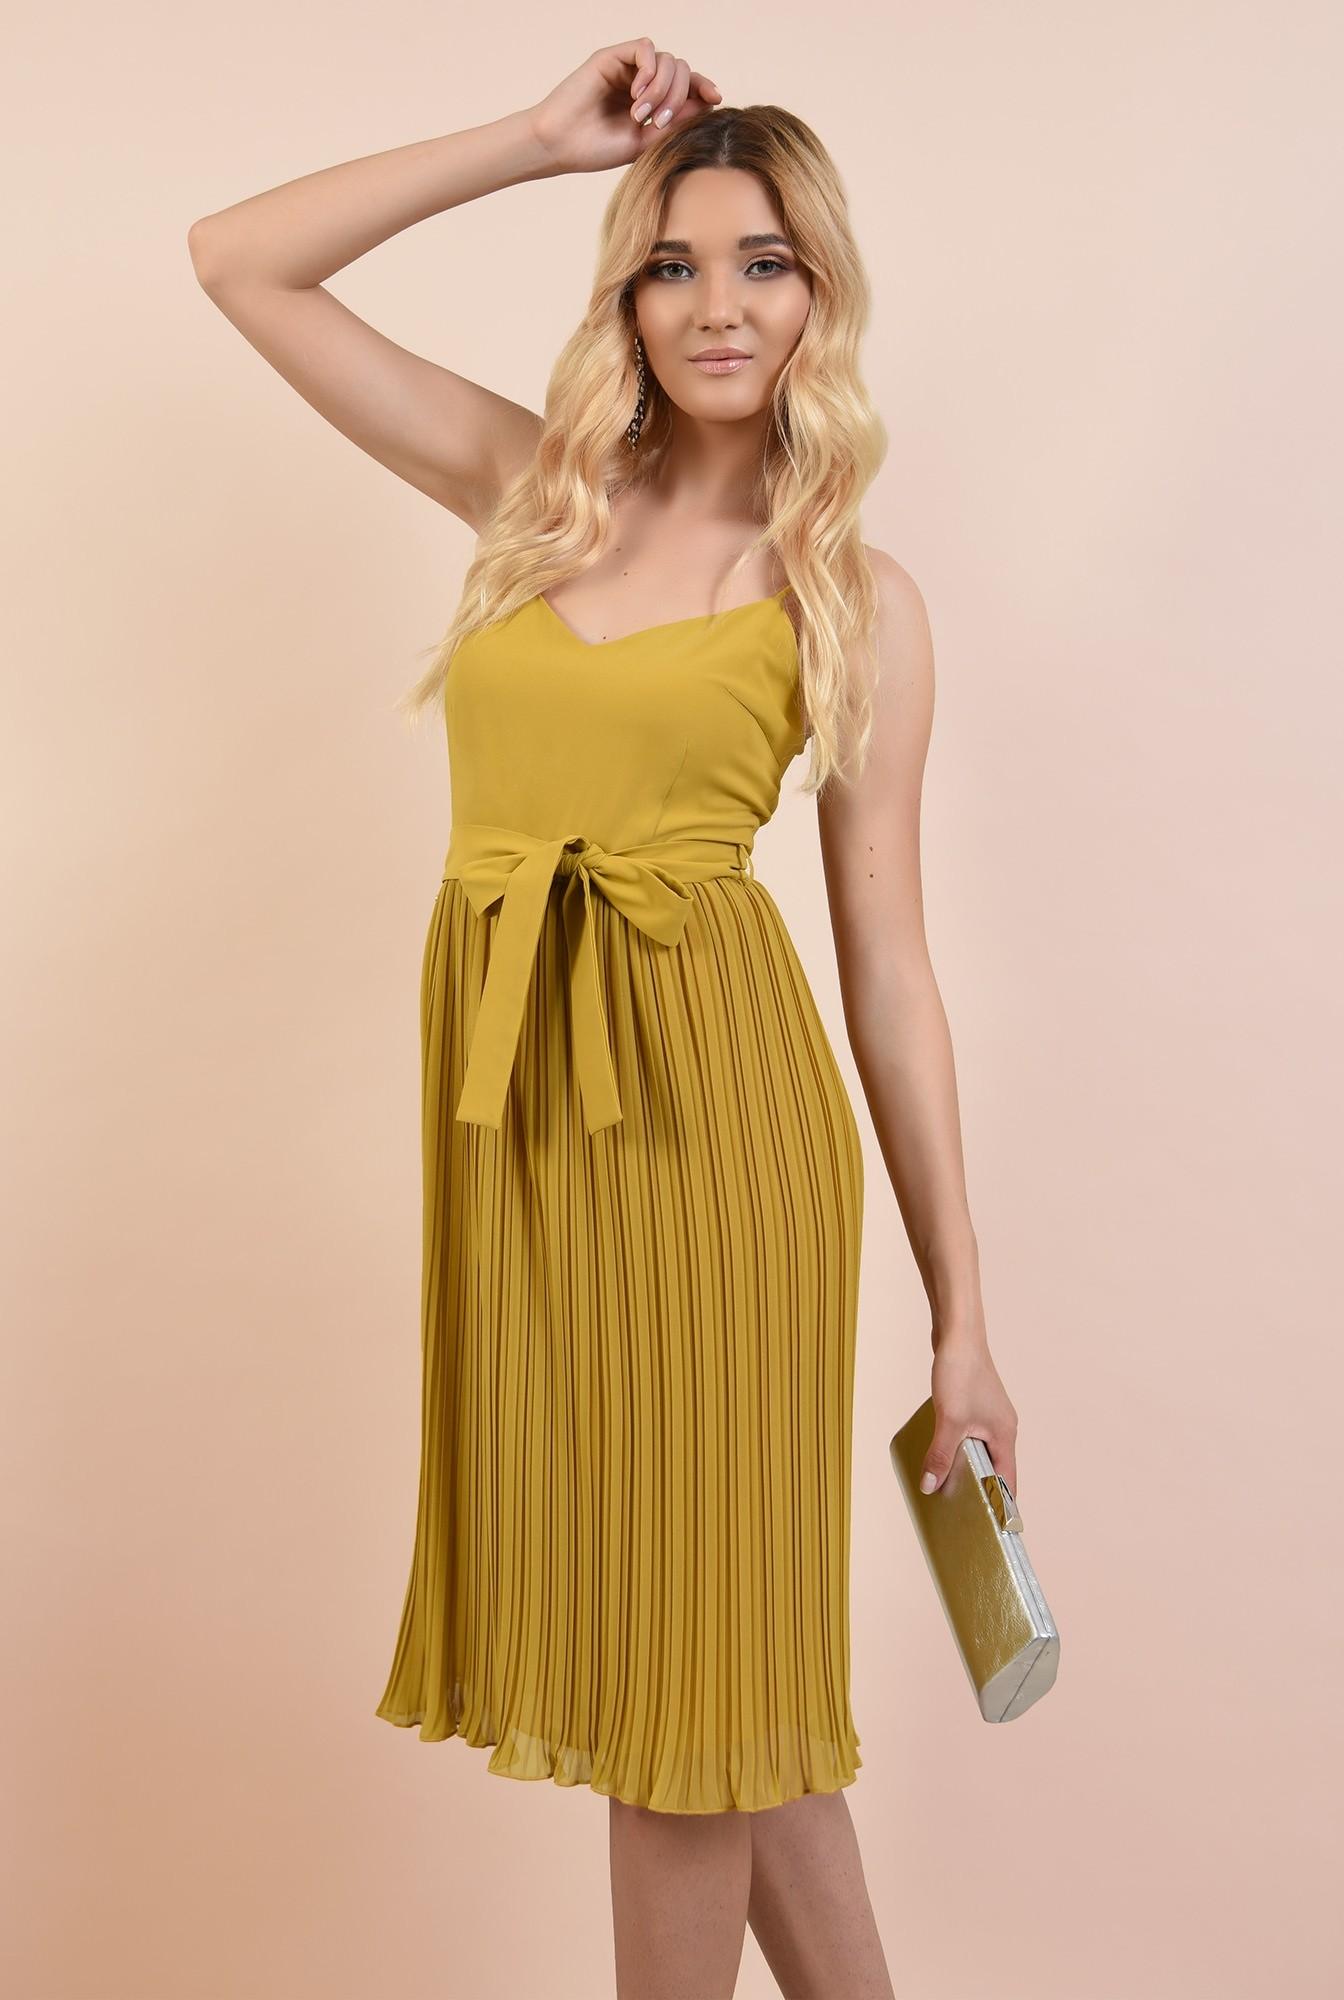 0 - 360 - rochie eleganta, mustar, cu bretele spaghetti, cordon in talie, fusta plisata